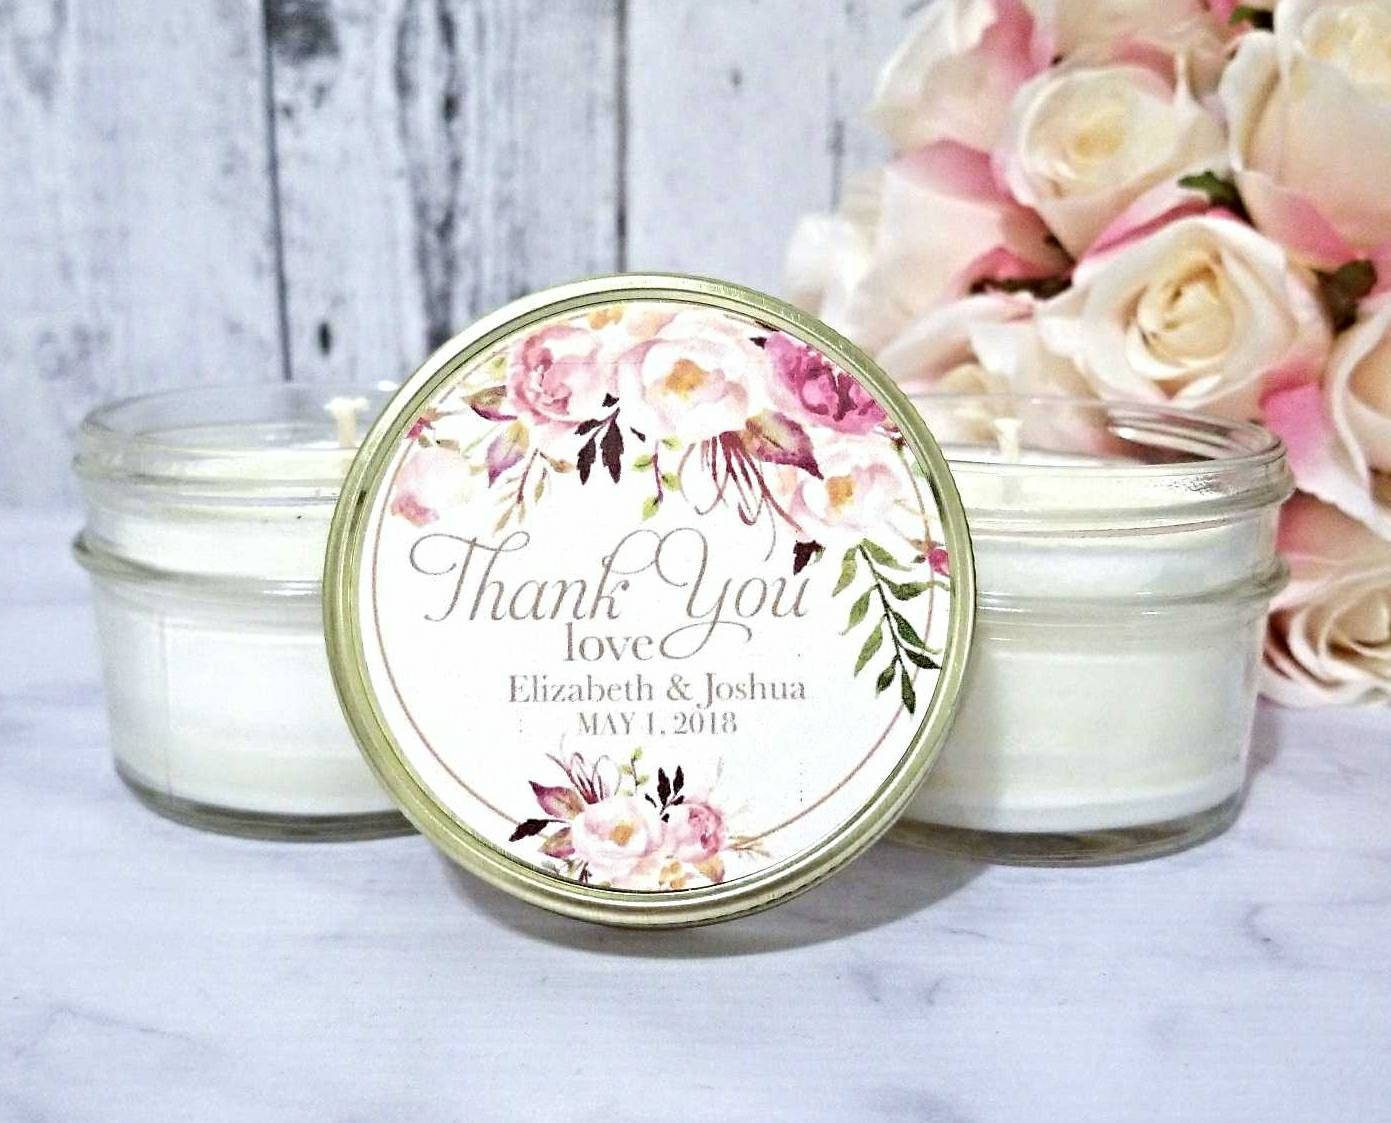 Blush Wedding Favors Candle - Wedding Favors Candles - Blush Wedding ...